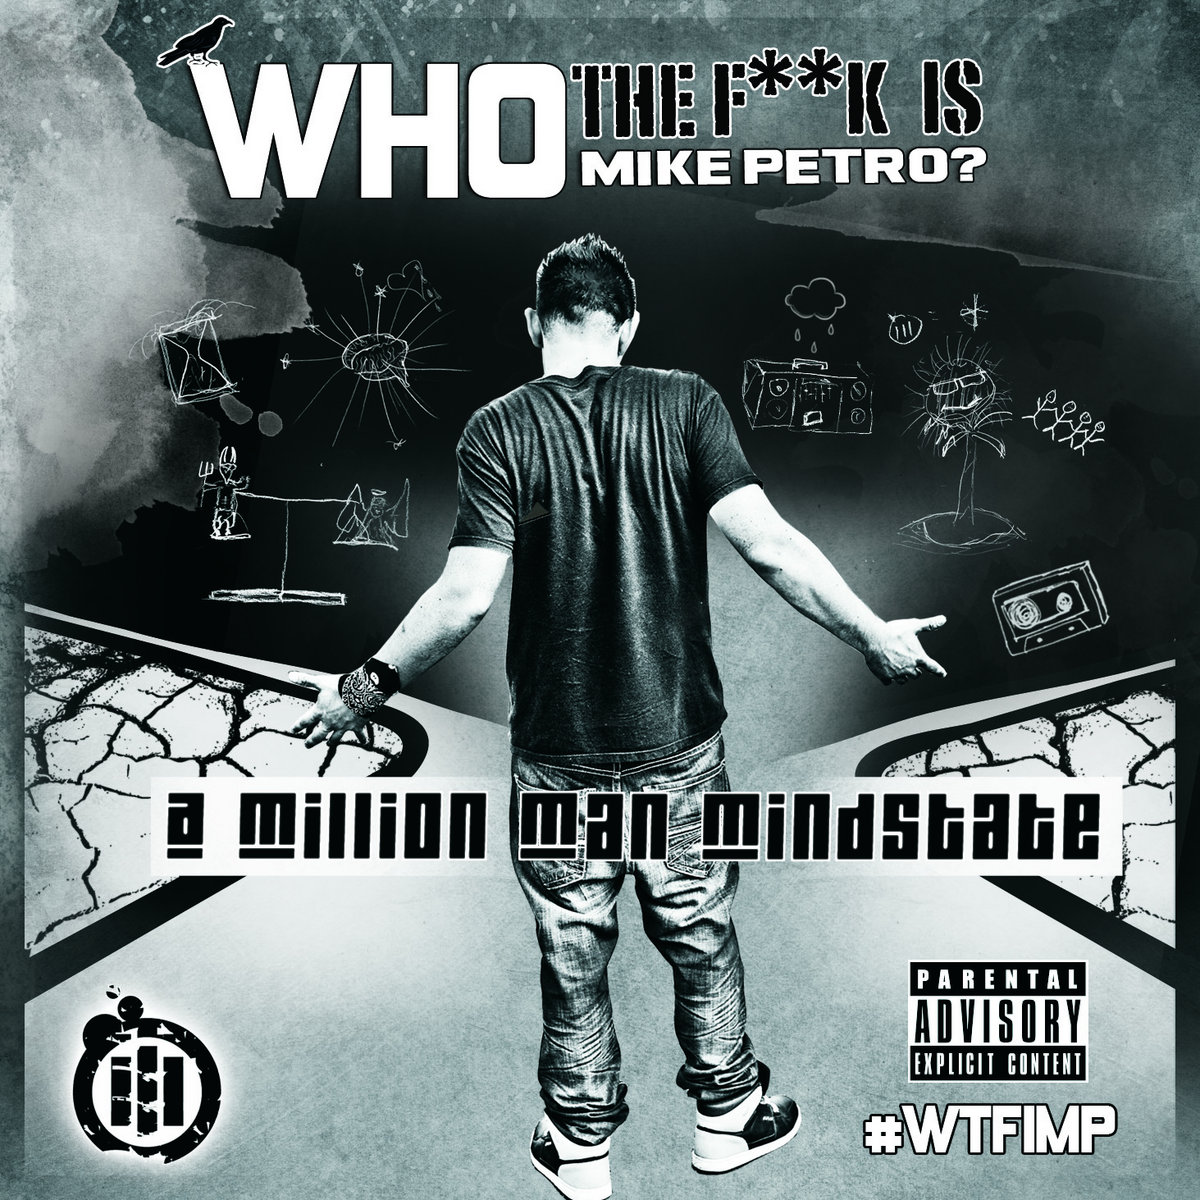 Millionaire mindstate lyrics